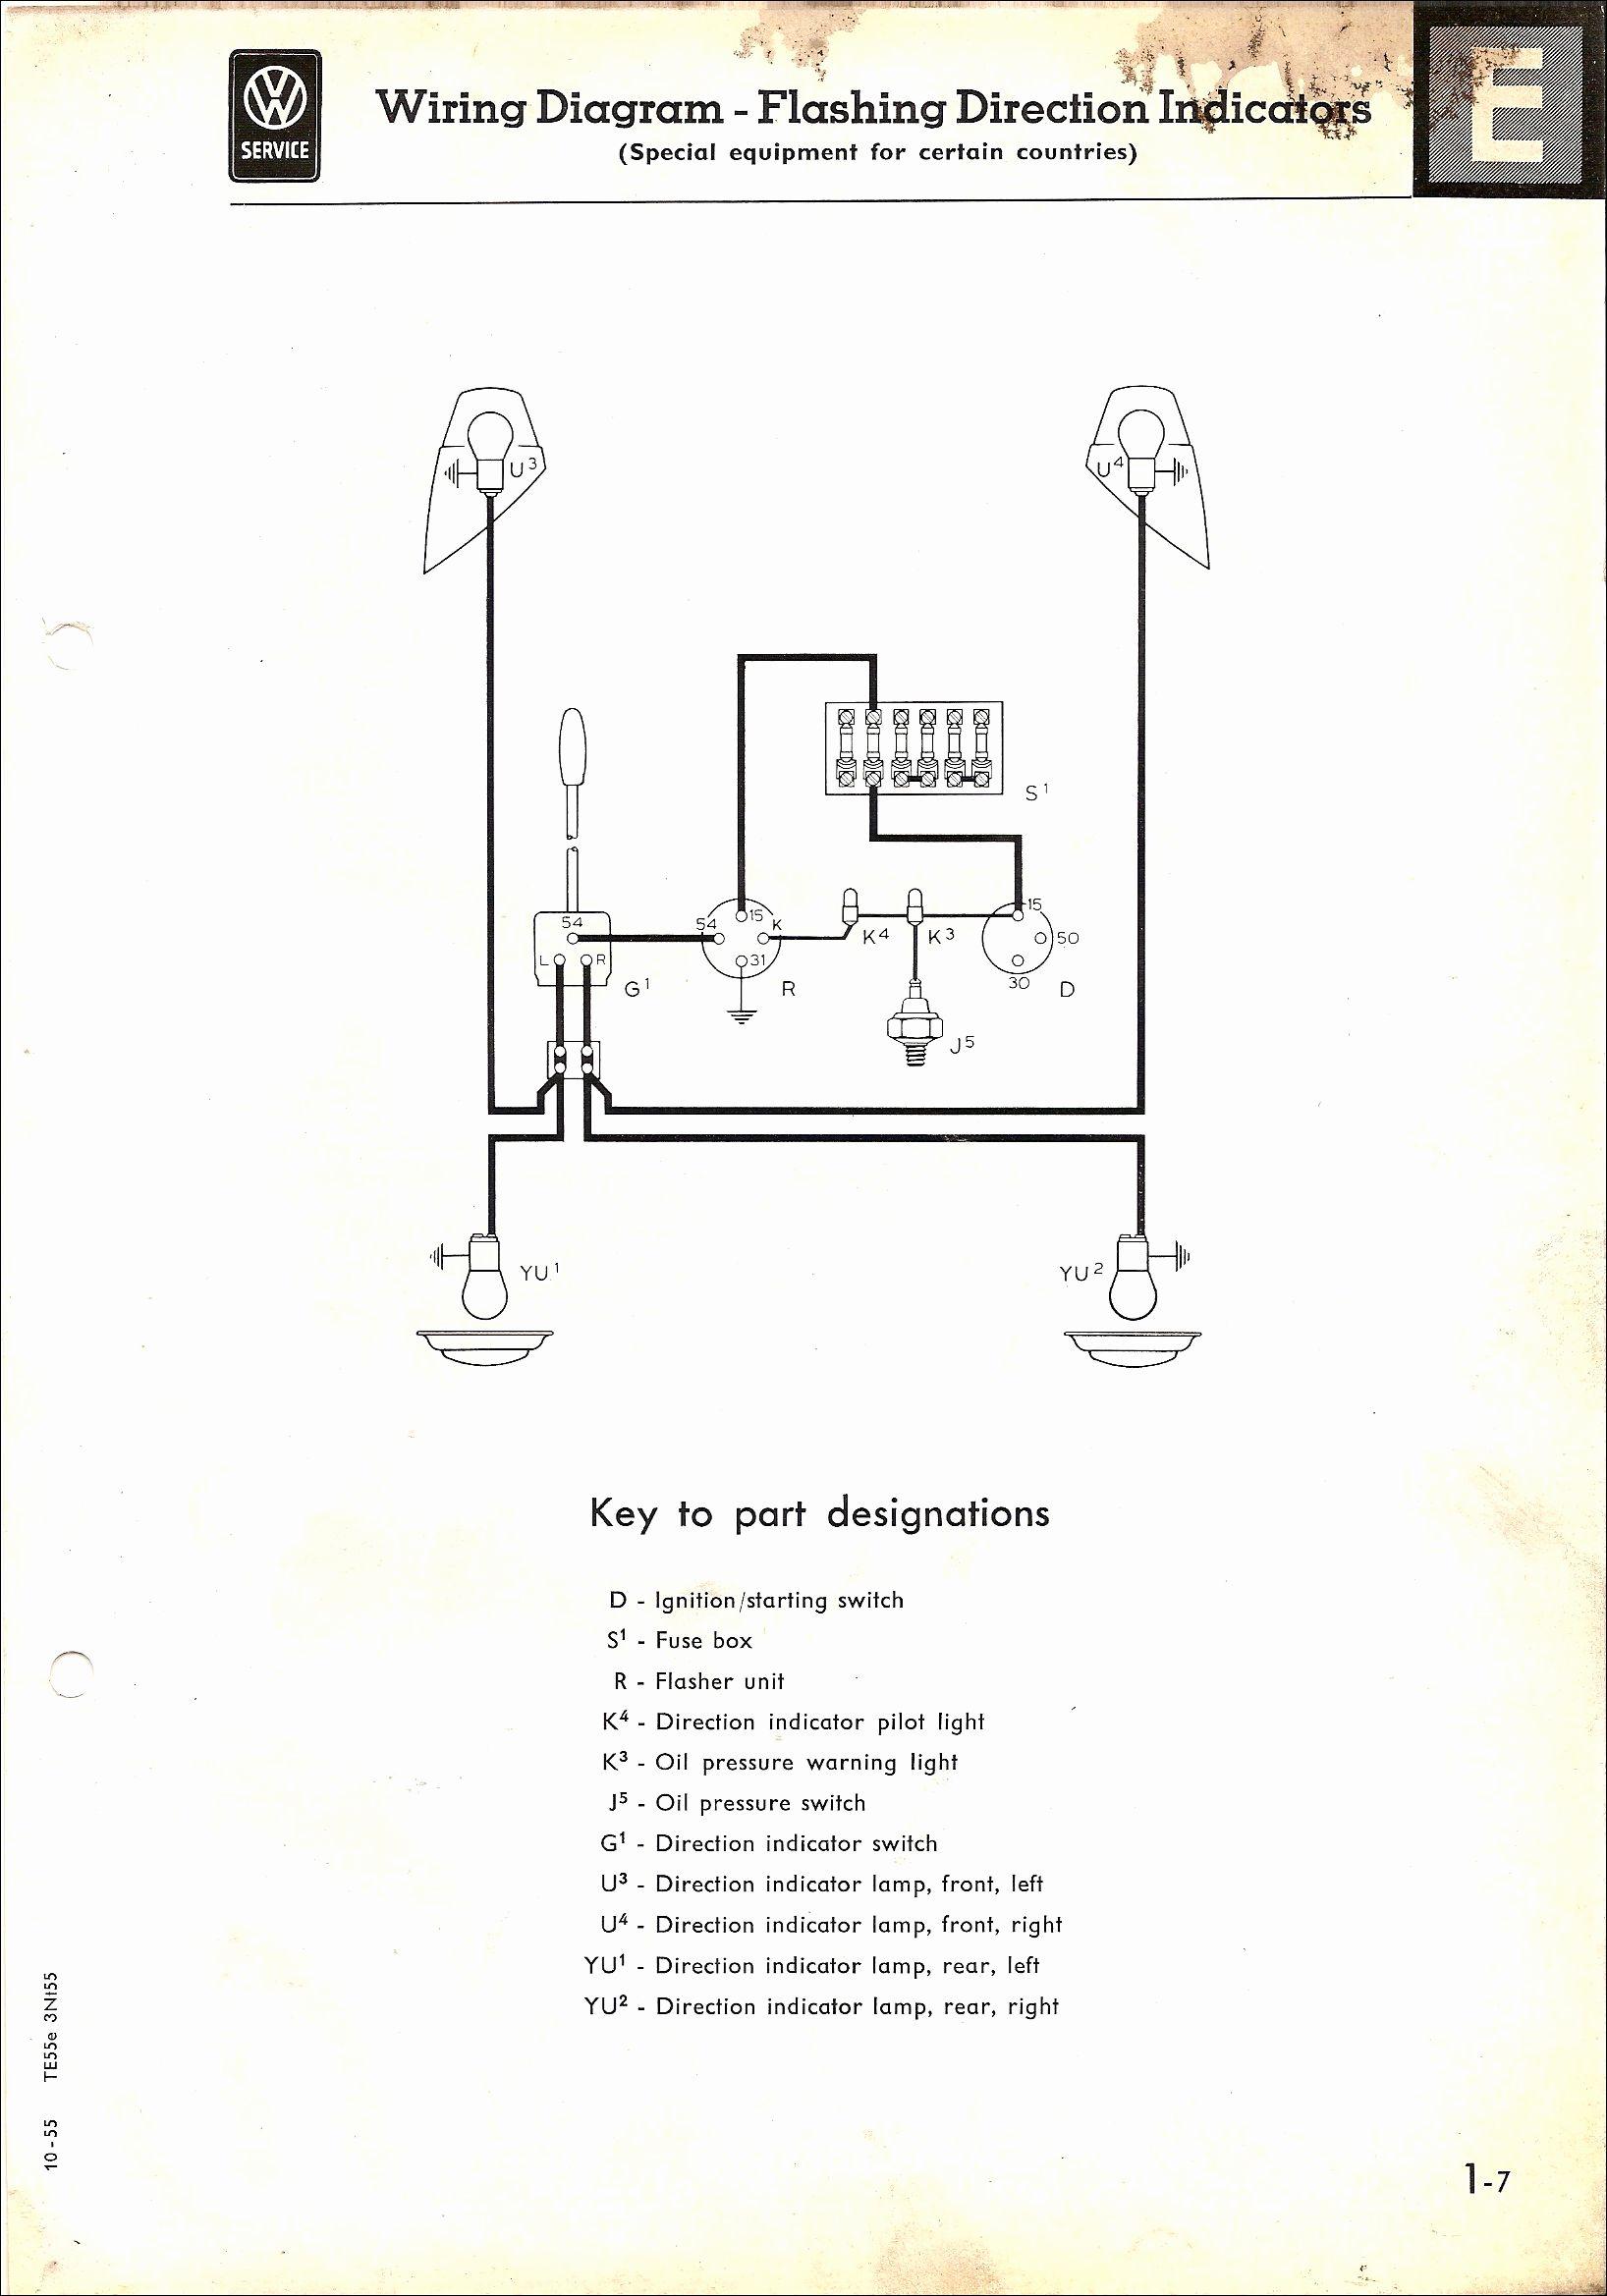 Trane Voyager Wiring Diagram   Best Wiring Library - Data Link Connector Wiring Diagram